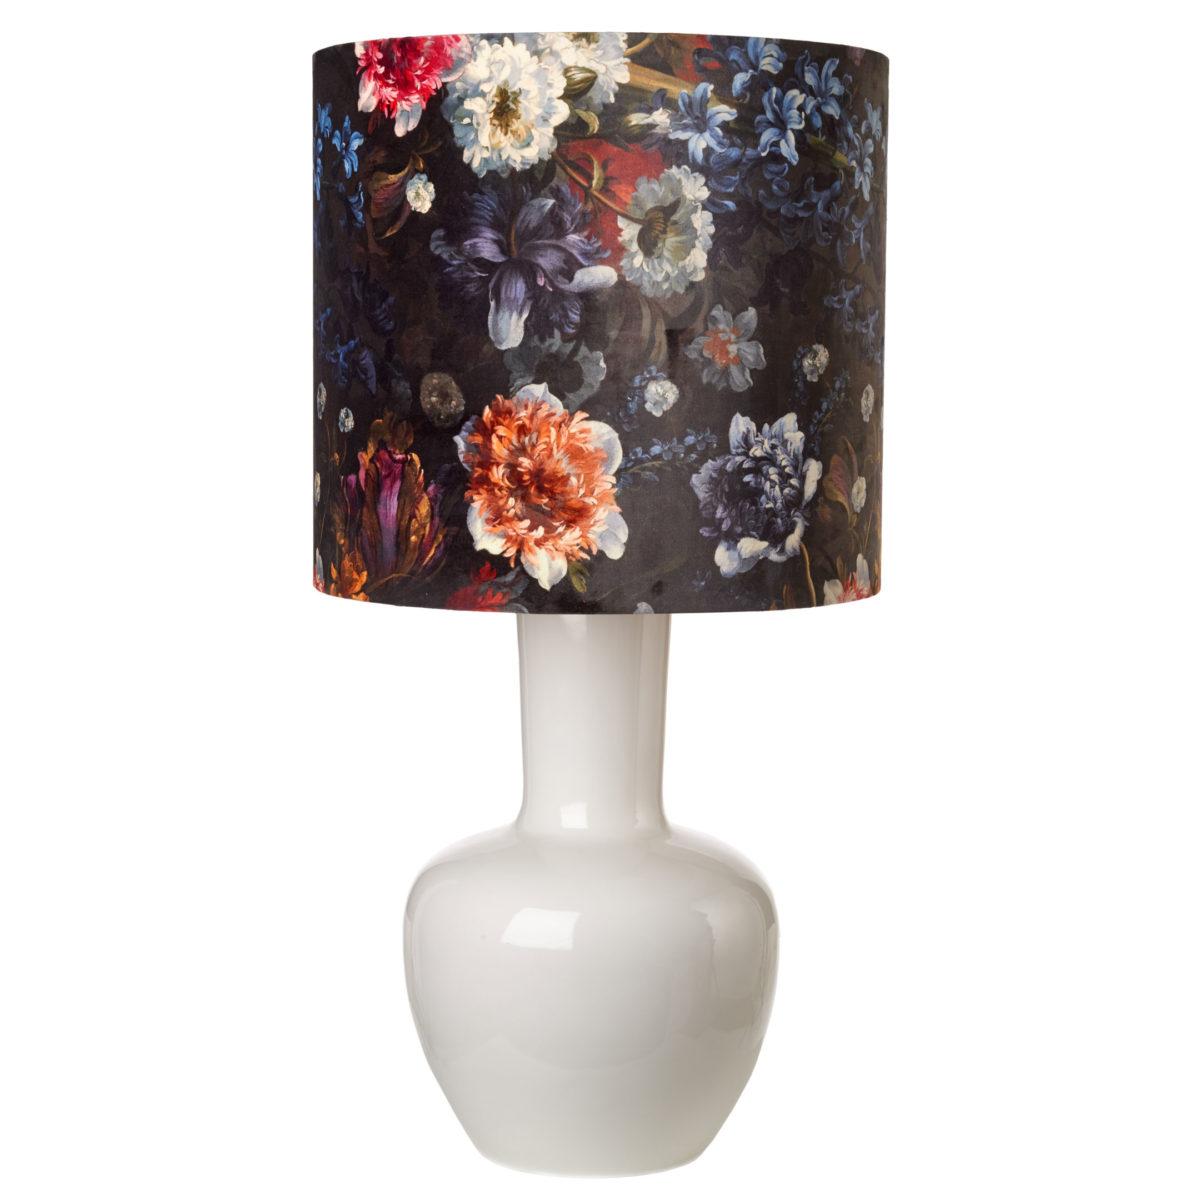 Абажур для лампы. Цветочный узор